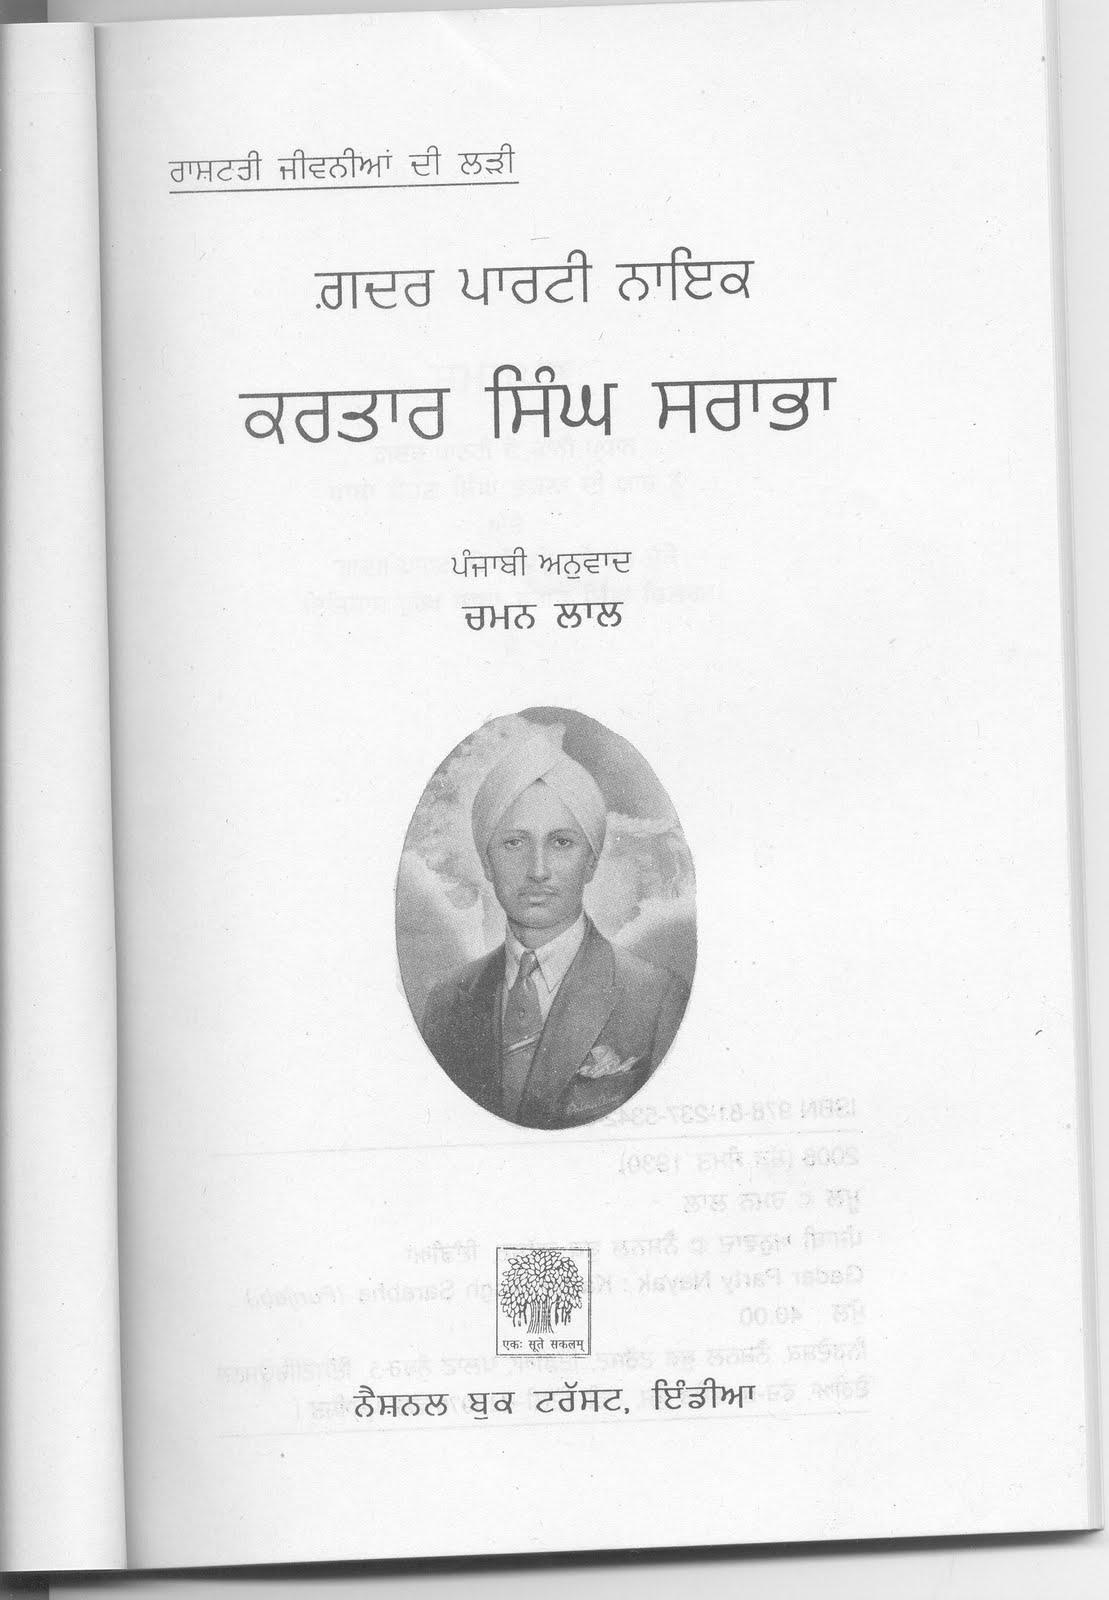 books on bhagat singh in english pdf